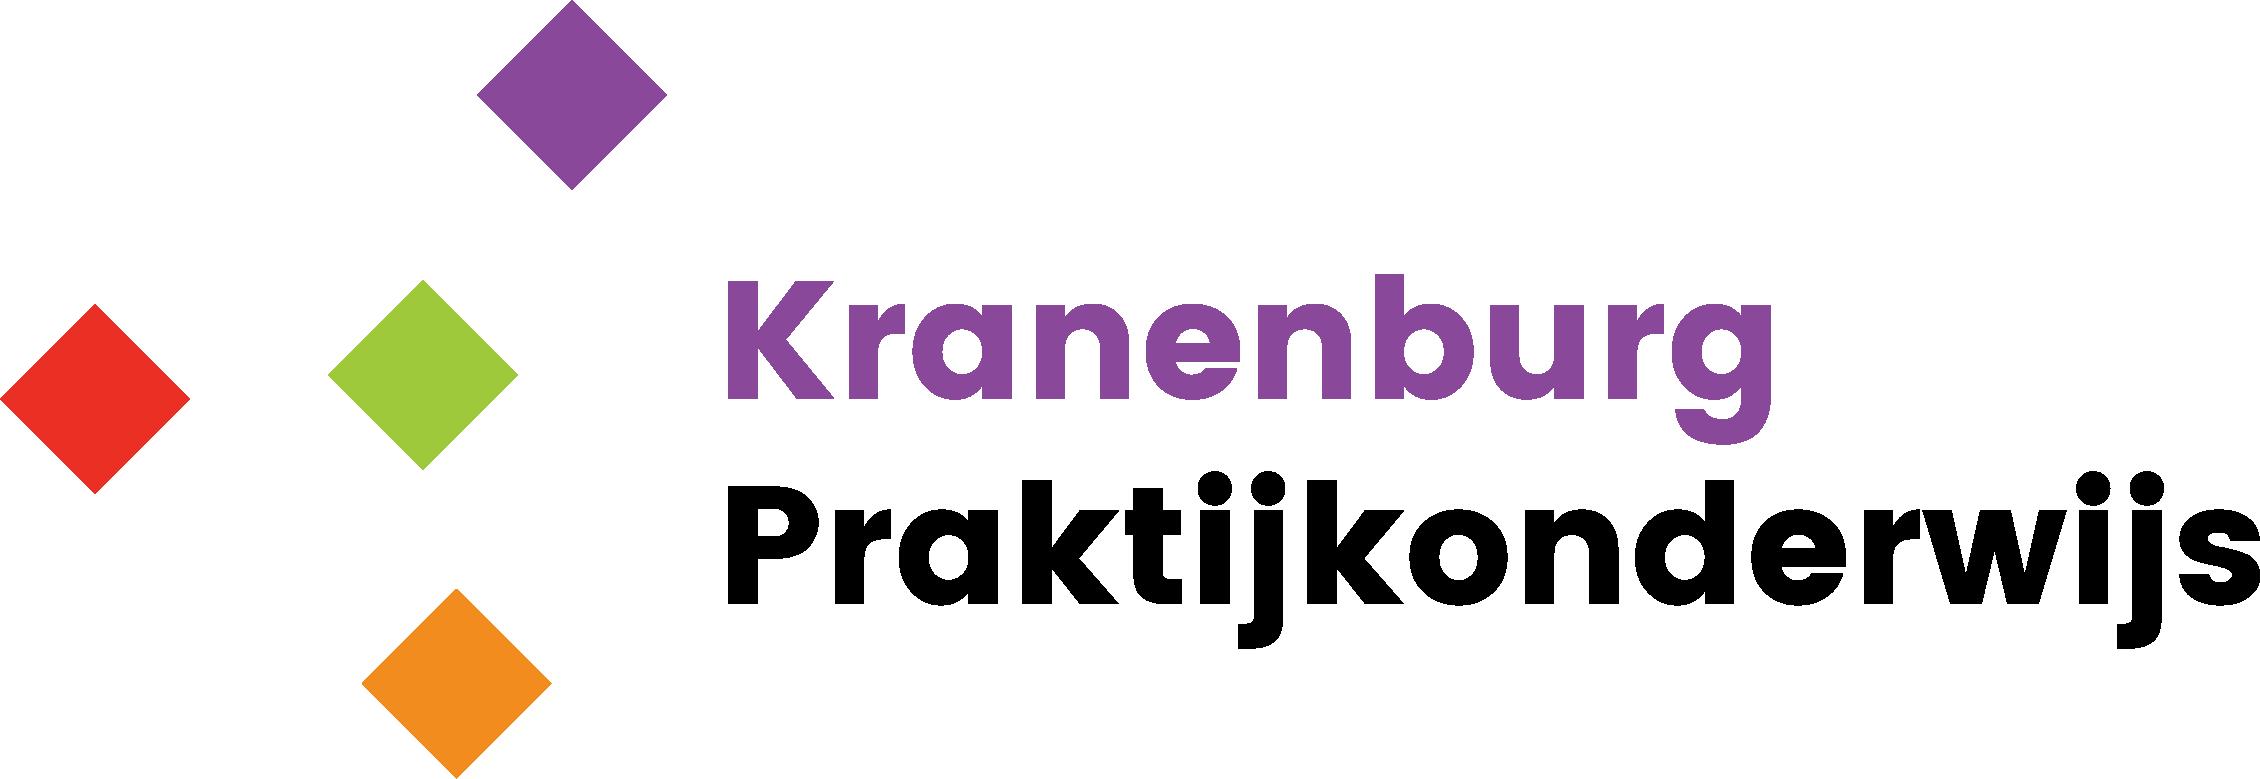 Kranenburg Praktijkonderwijs logo